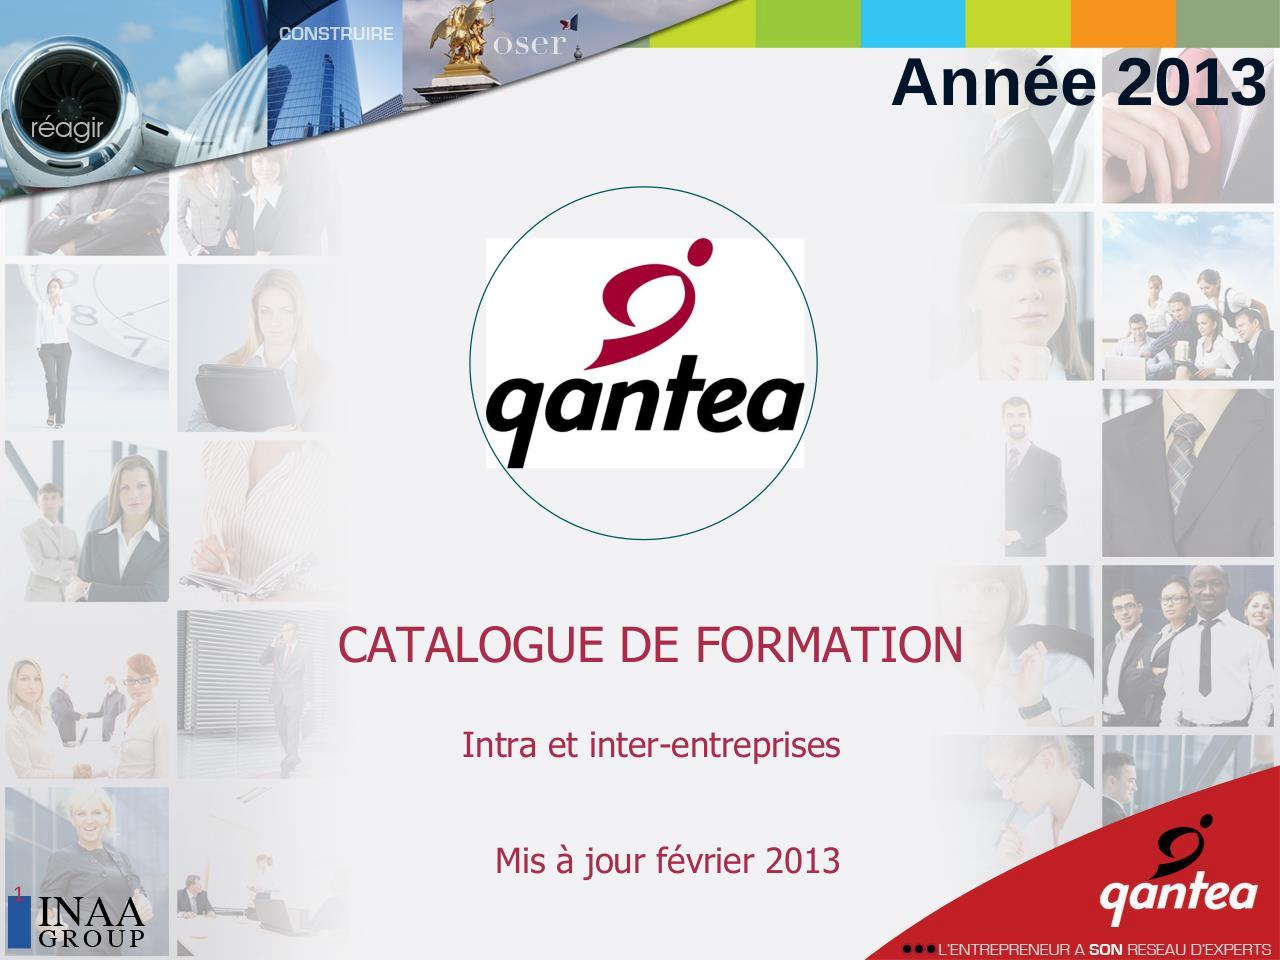 pr sentation powerpoint catalogue formation qantea 2013. Black Bedroom Furniture Sets. Home Design Ideas